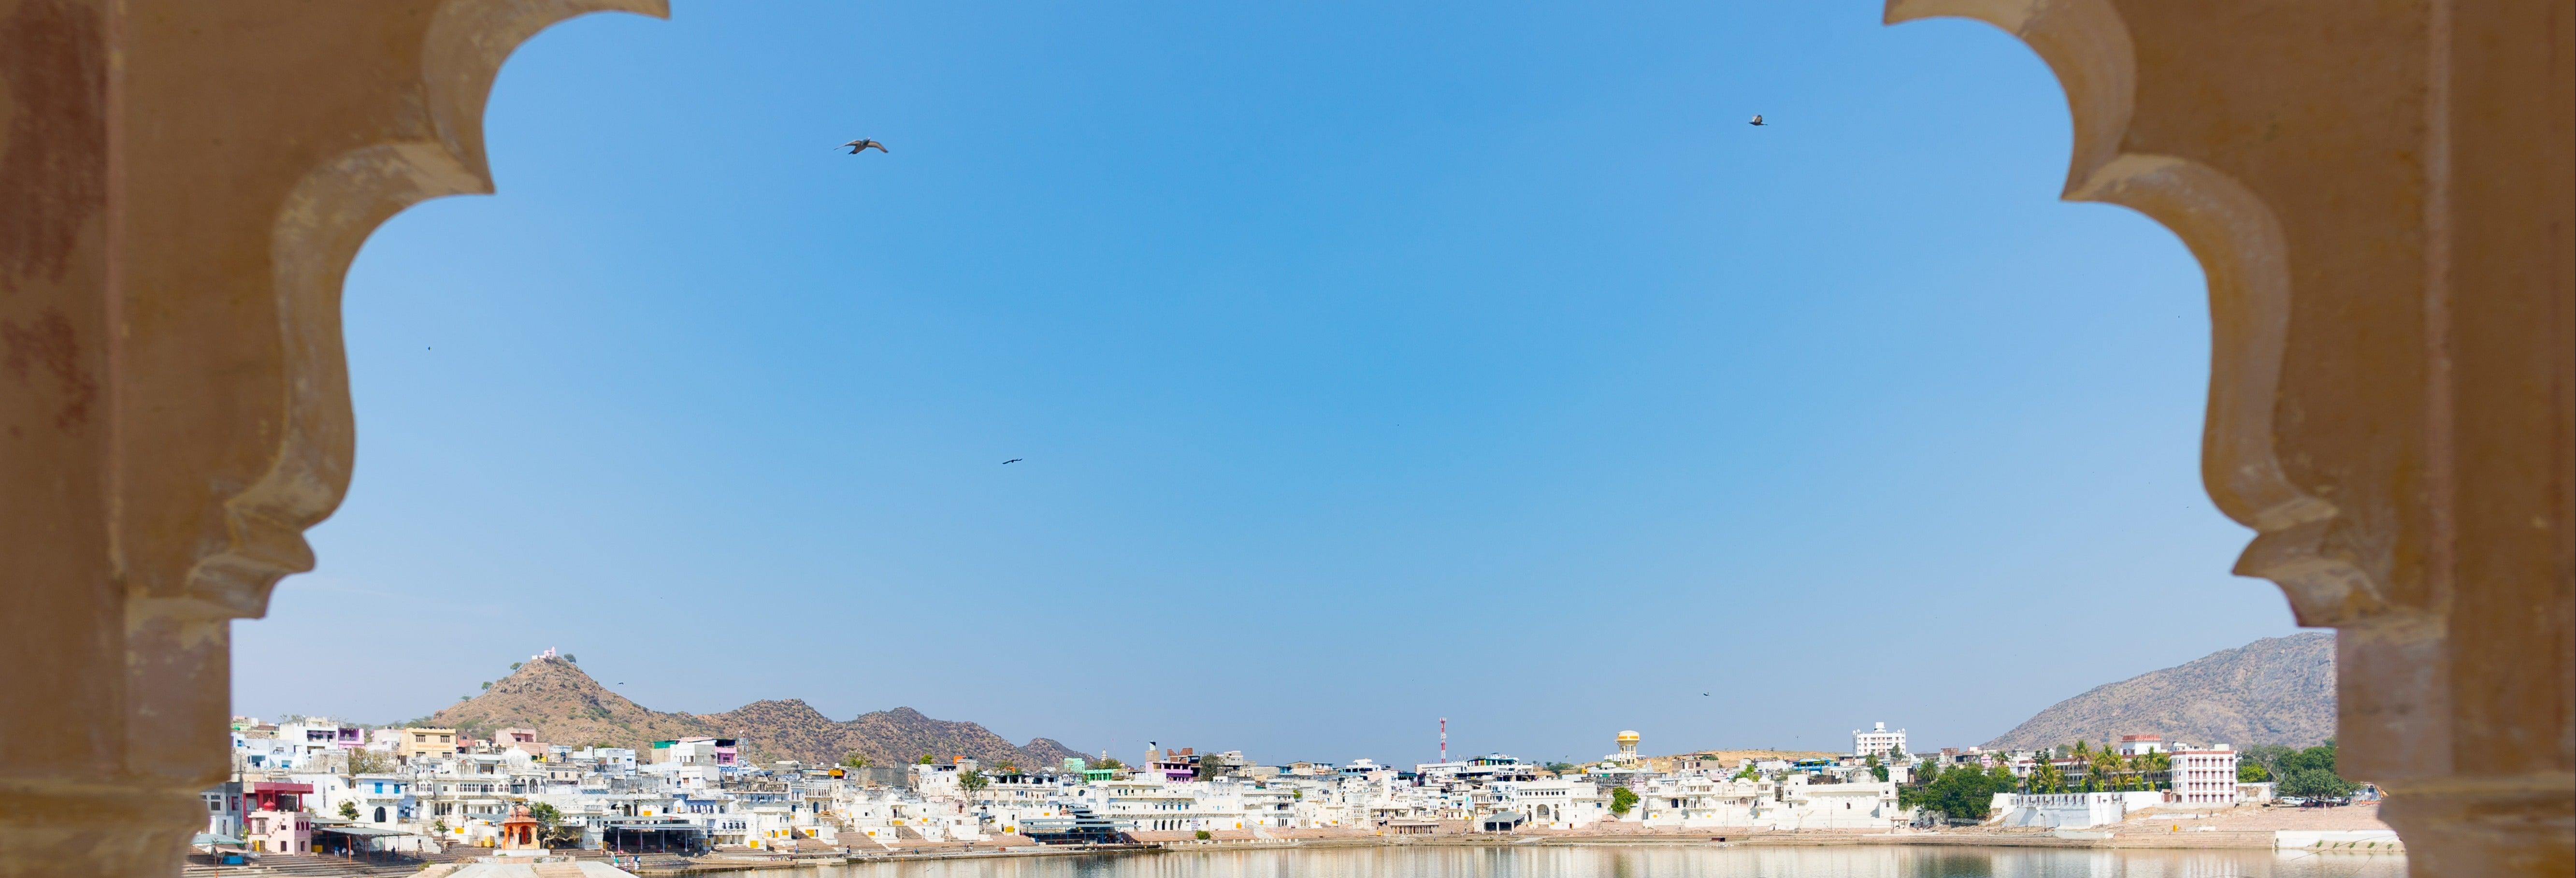 Tour por los ghats de Púshkar